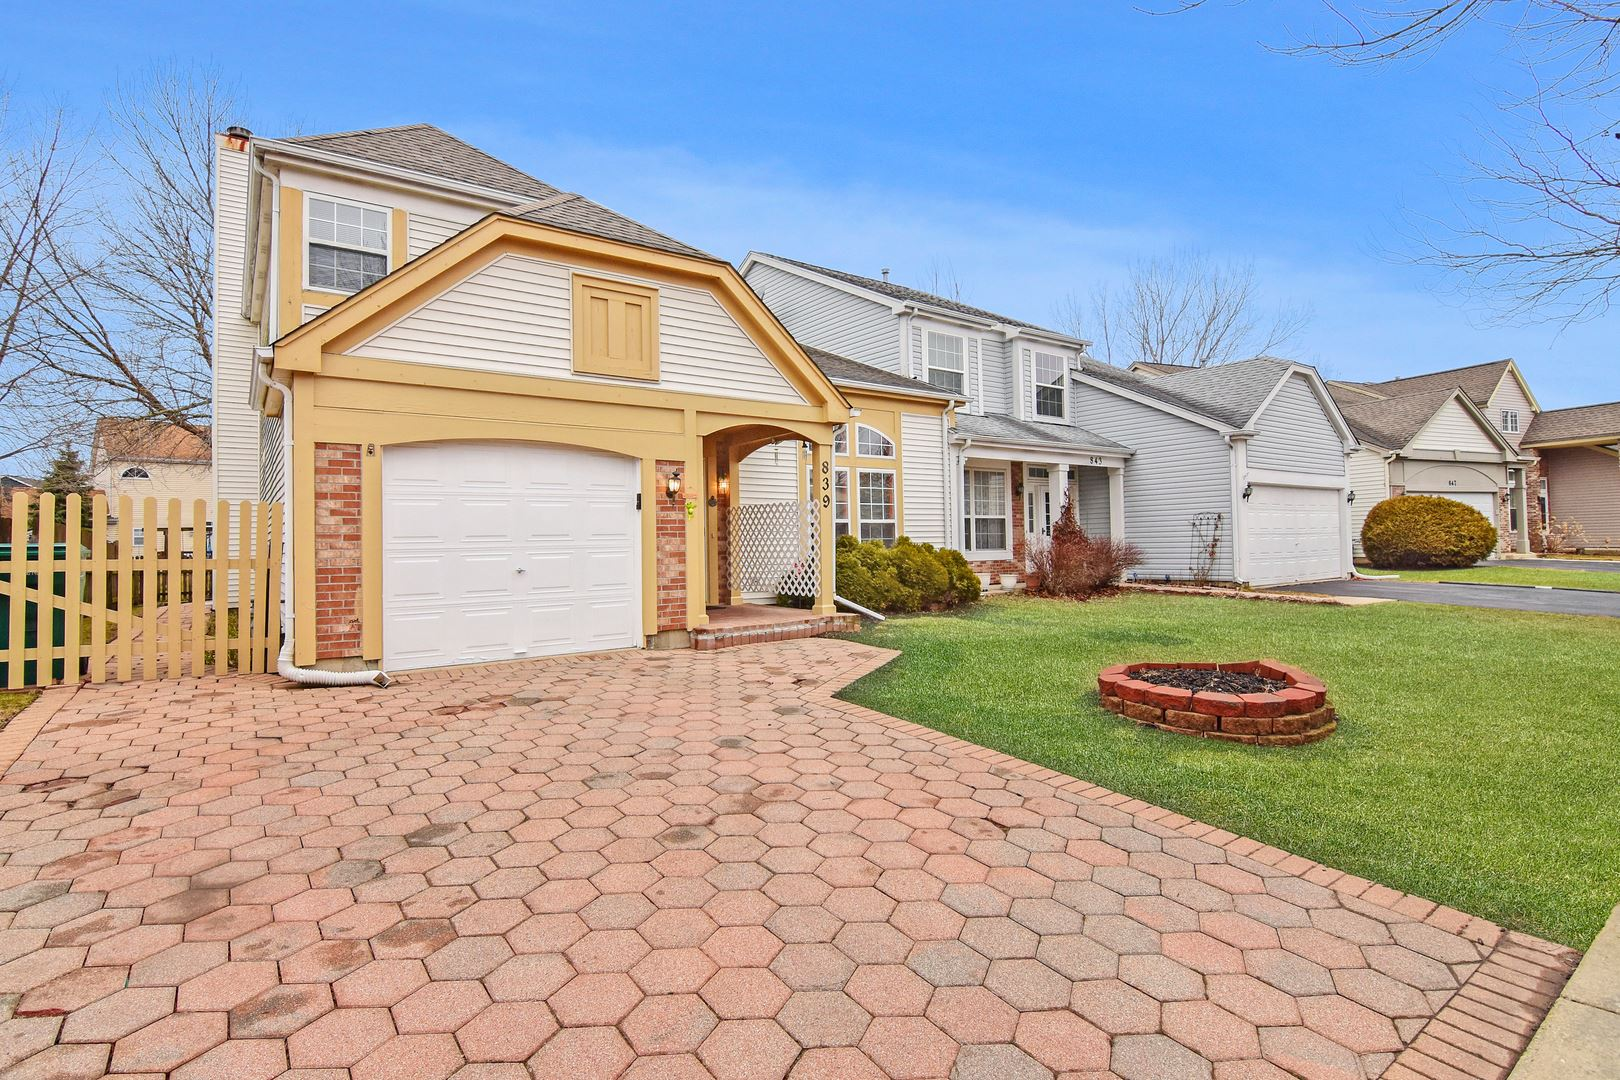 839 Crossland Drive, Grayslake, IL 60030 - #: 10666035